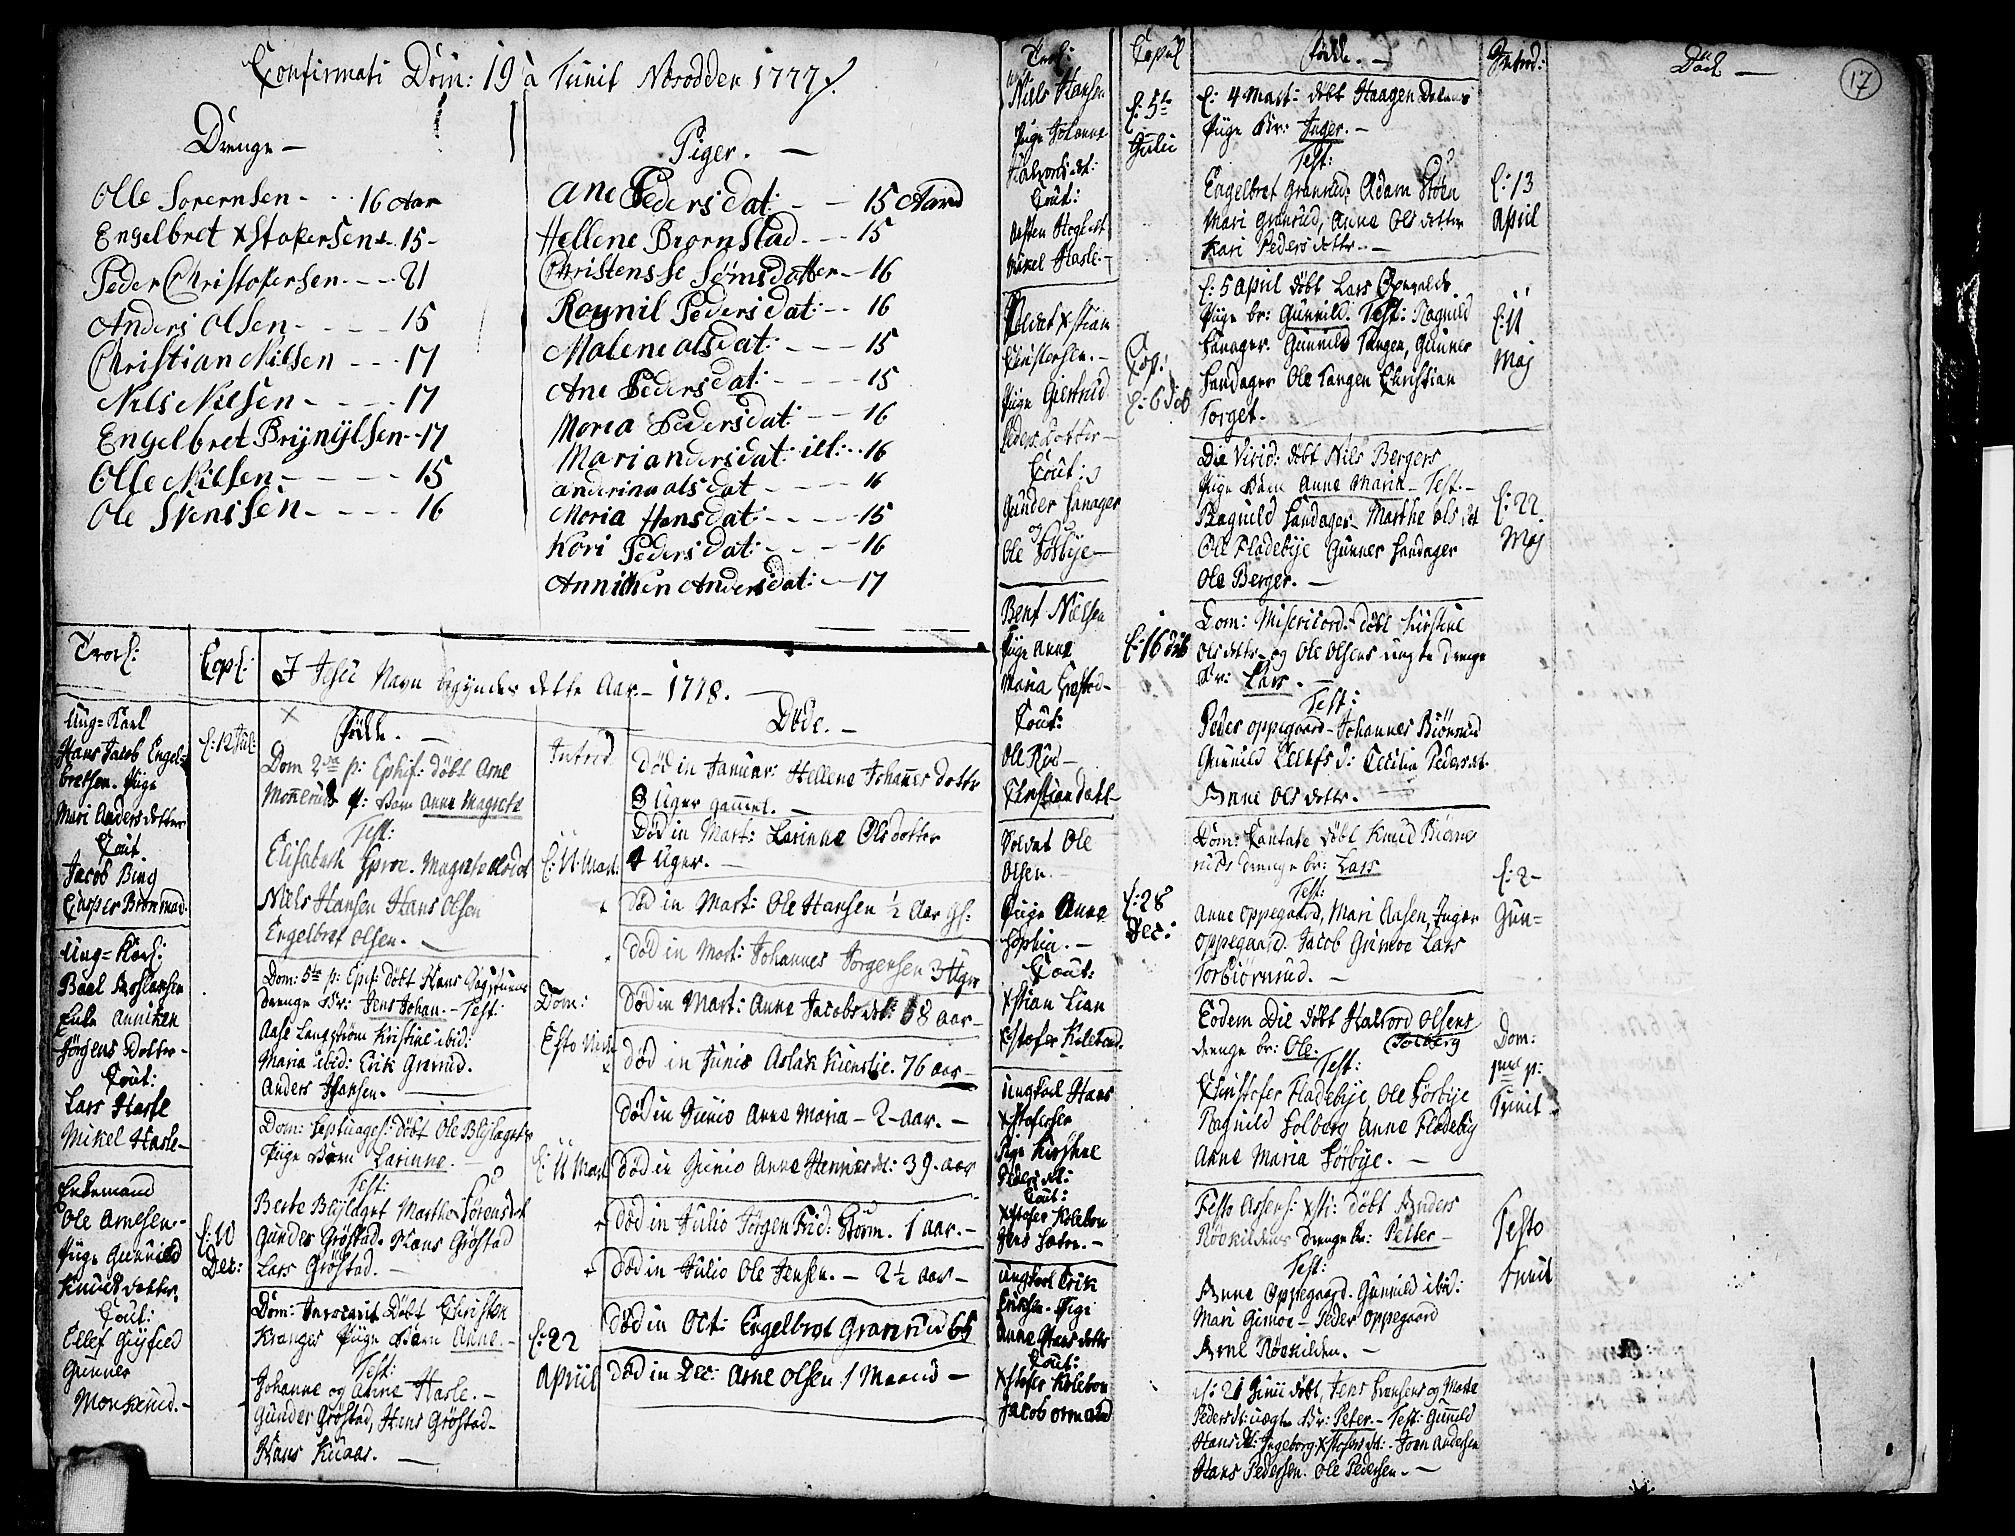 SAO, Nesodden prestekontor Kirkebøker, F/Fa/L0003: Ministerialbok nr. I 3, 1769-1780, s. 17